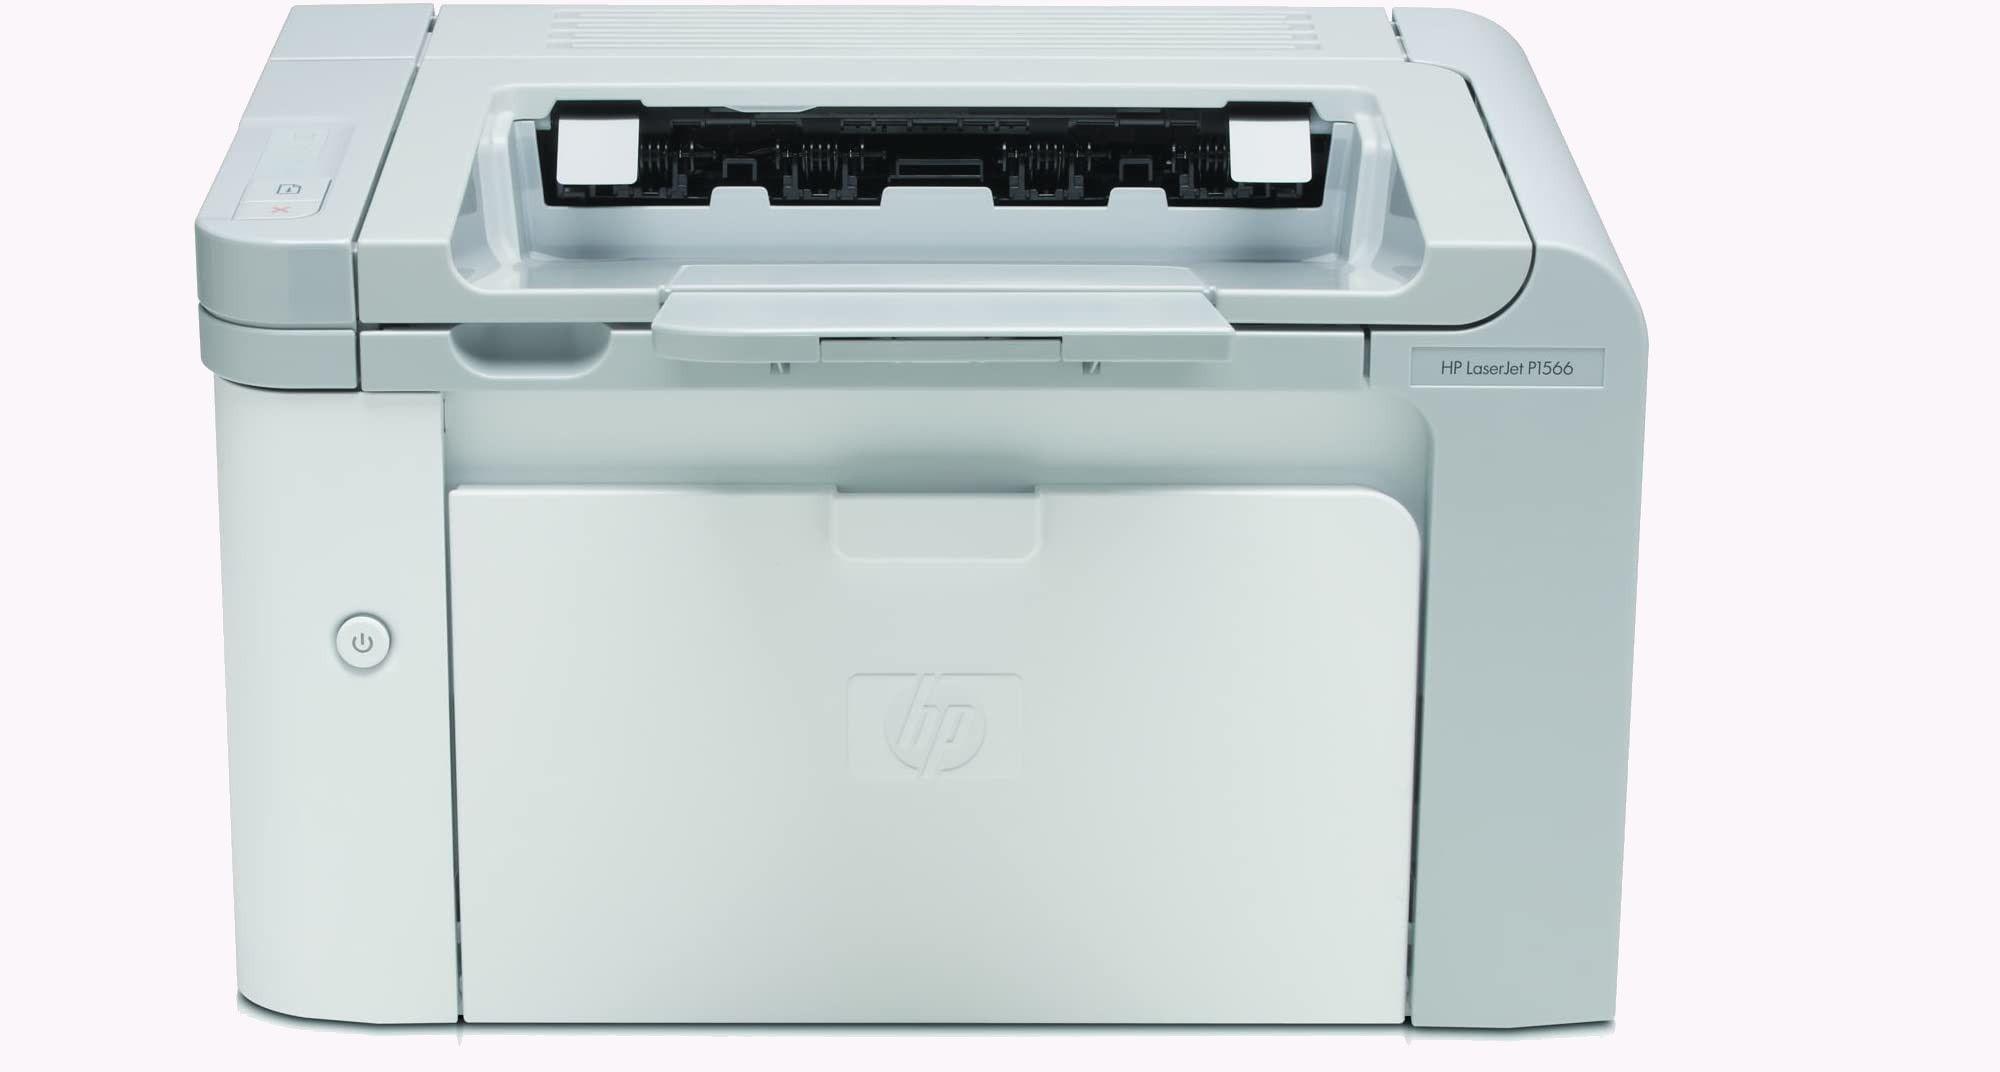 Impresoras Hp Laserjet Pro P1566 Impresora H P Cartuchos De Tinta